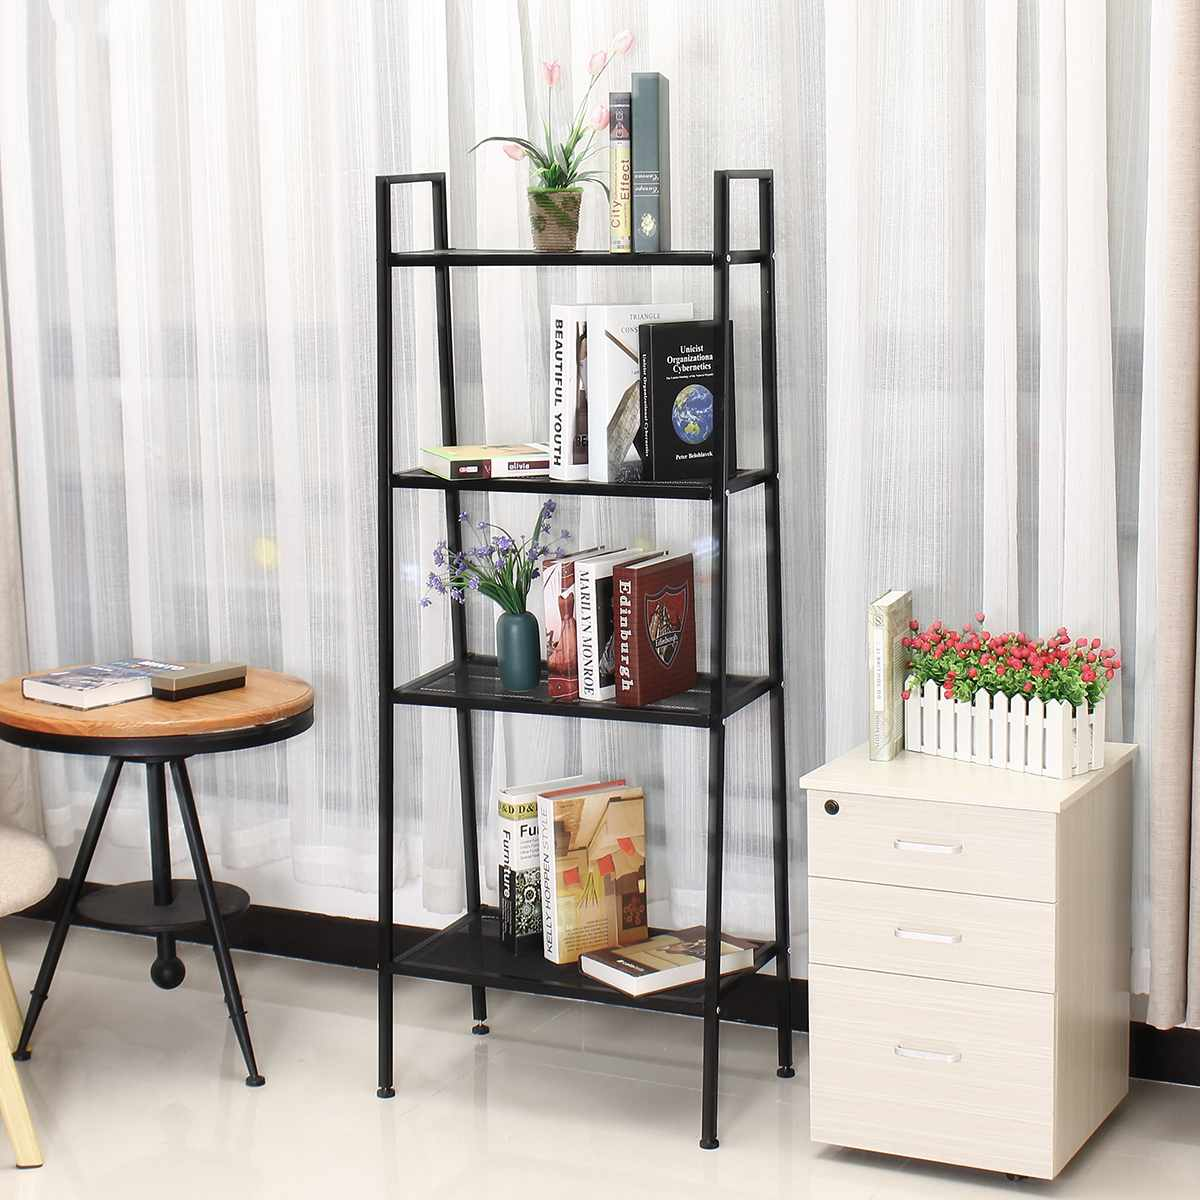 4 Tiers Wall Leaning Ladder Shelf Bookcase Bookshelf Storage